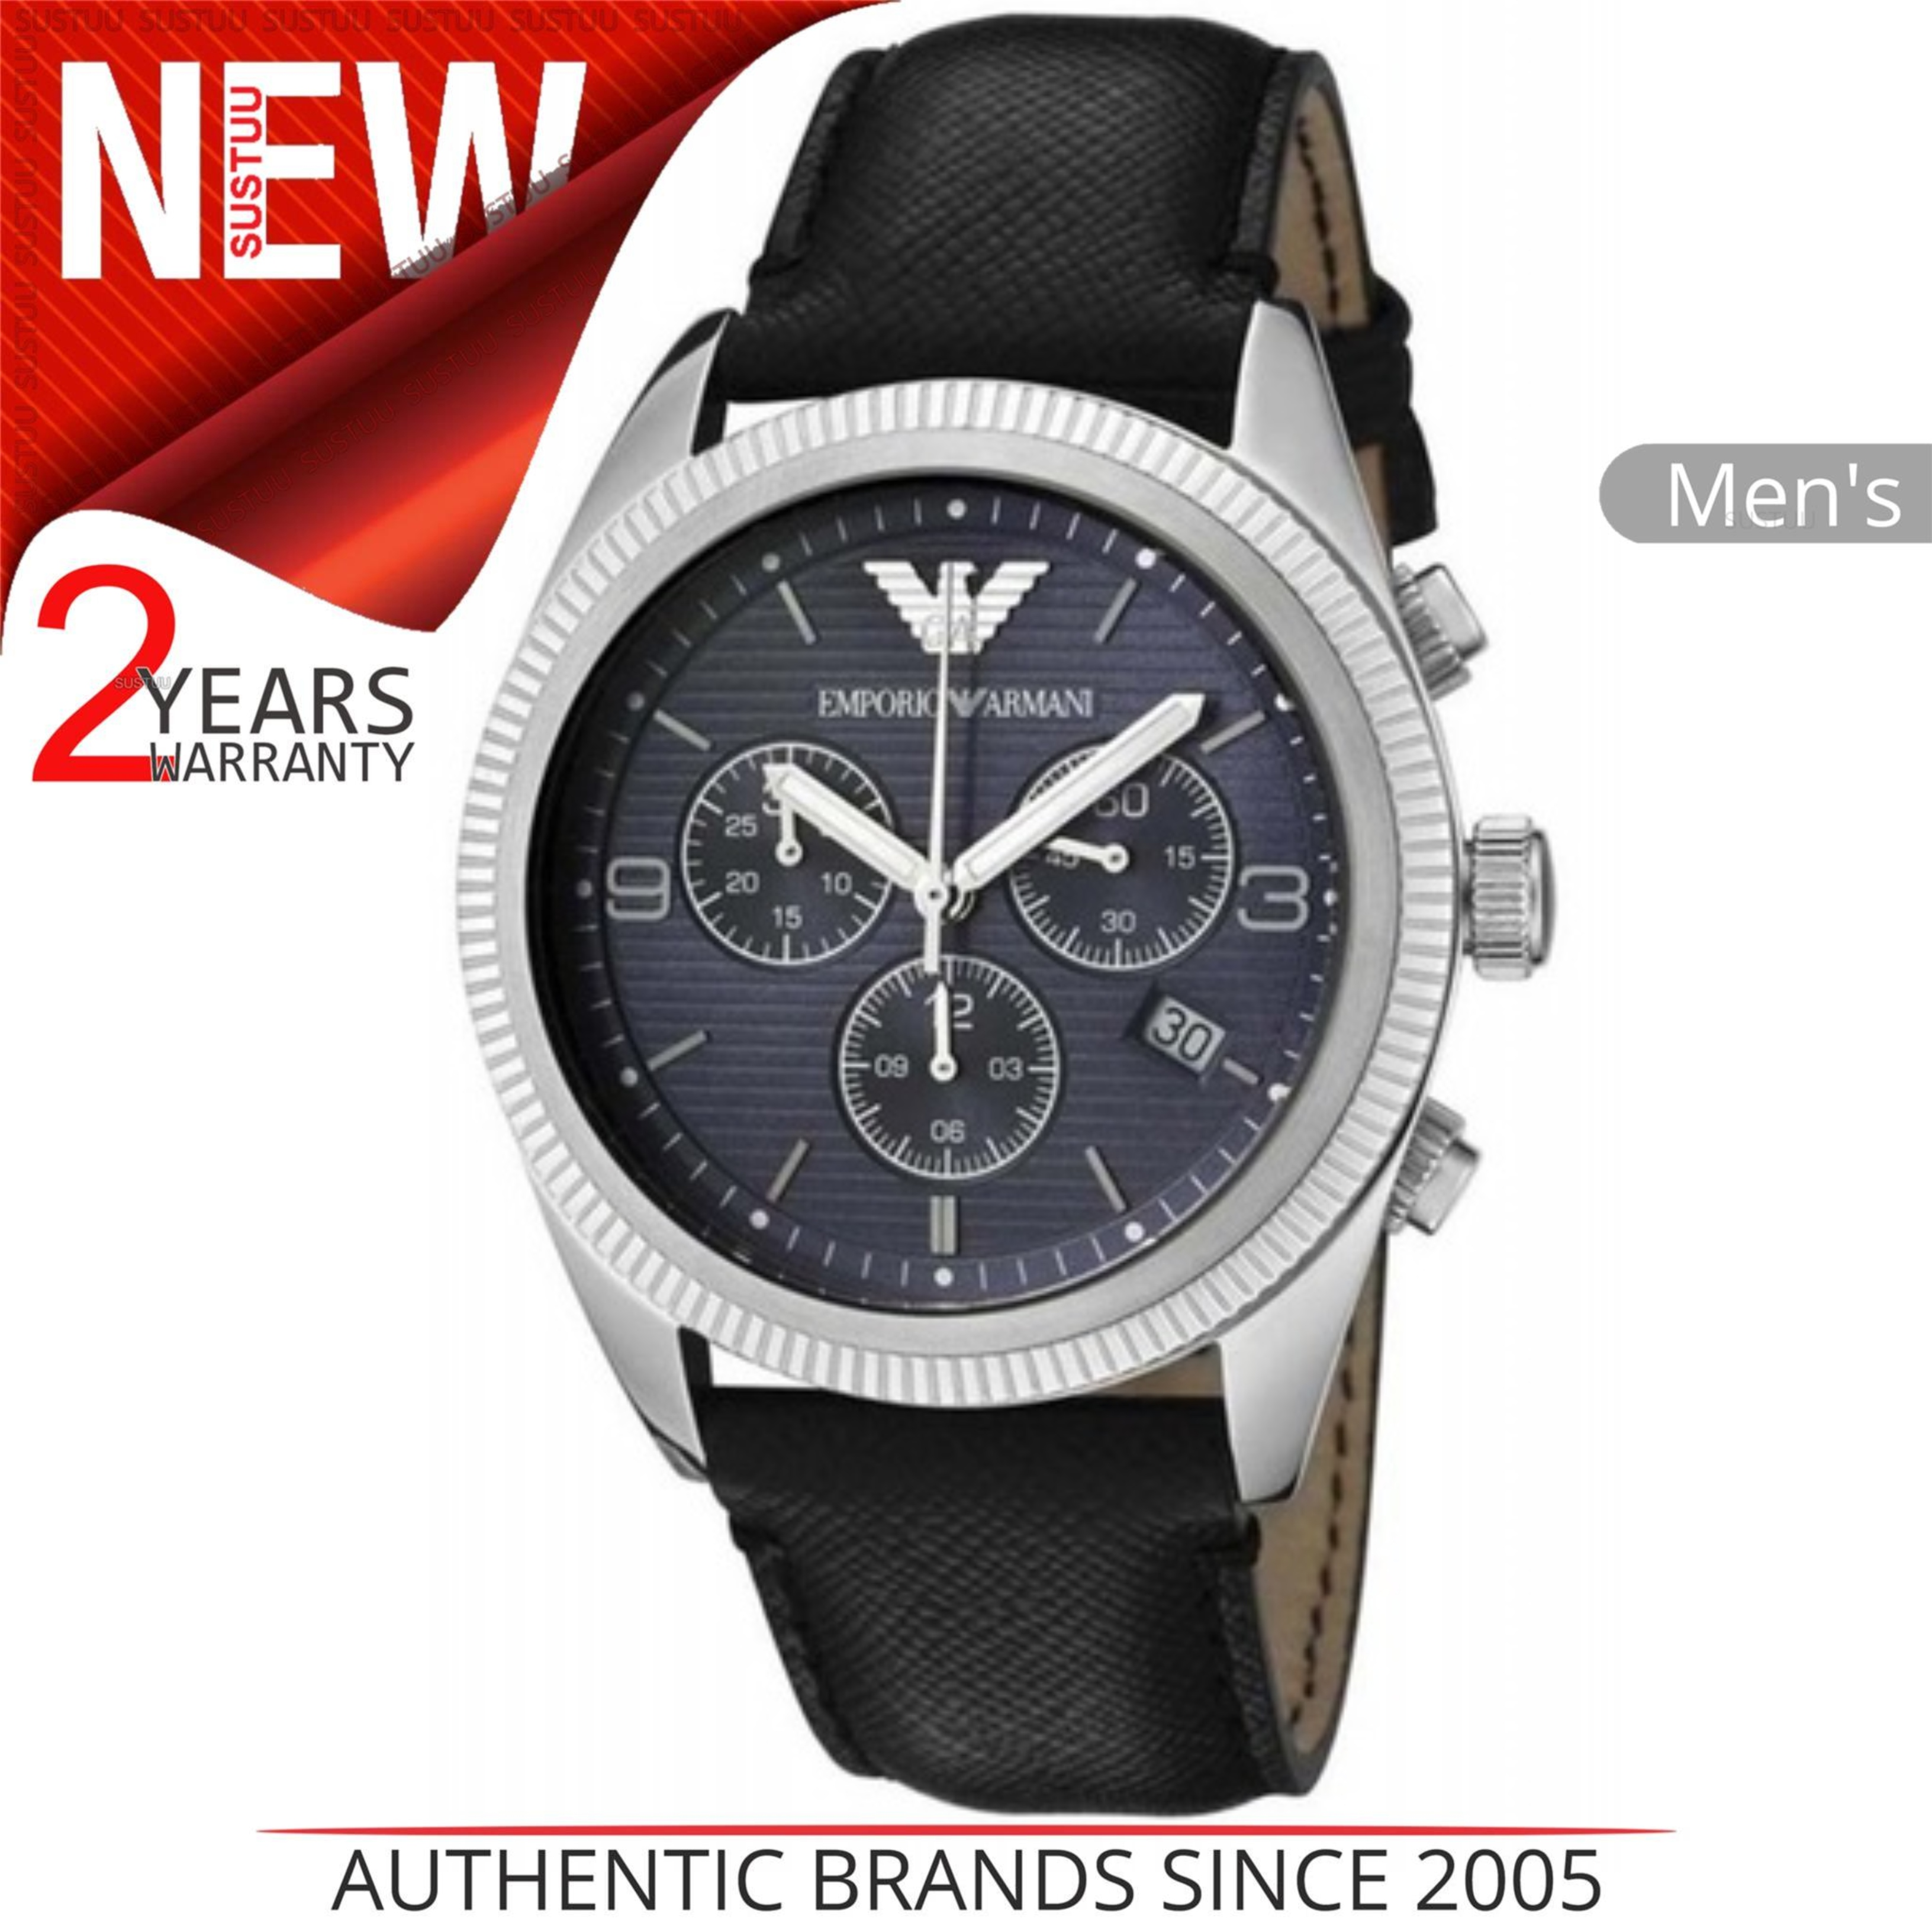 6eb6058c56eb CENTINELA Reloj Emporio Armani Sportivo para hombre AR5896│ Cronógrafo Dial  azul marino Correa de cuero